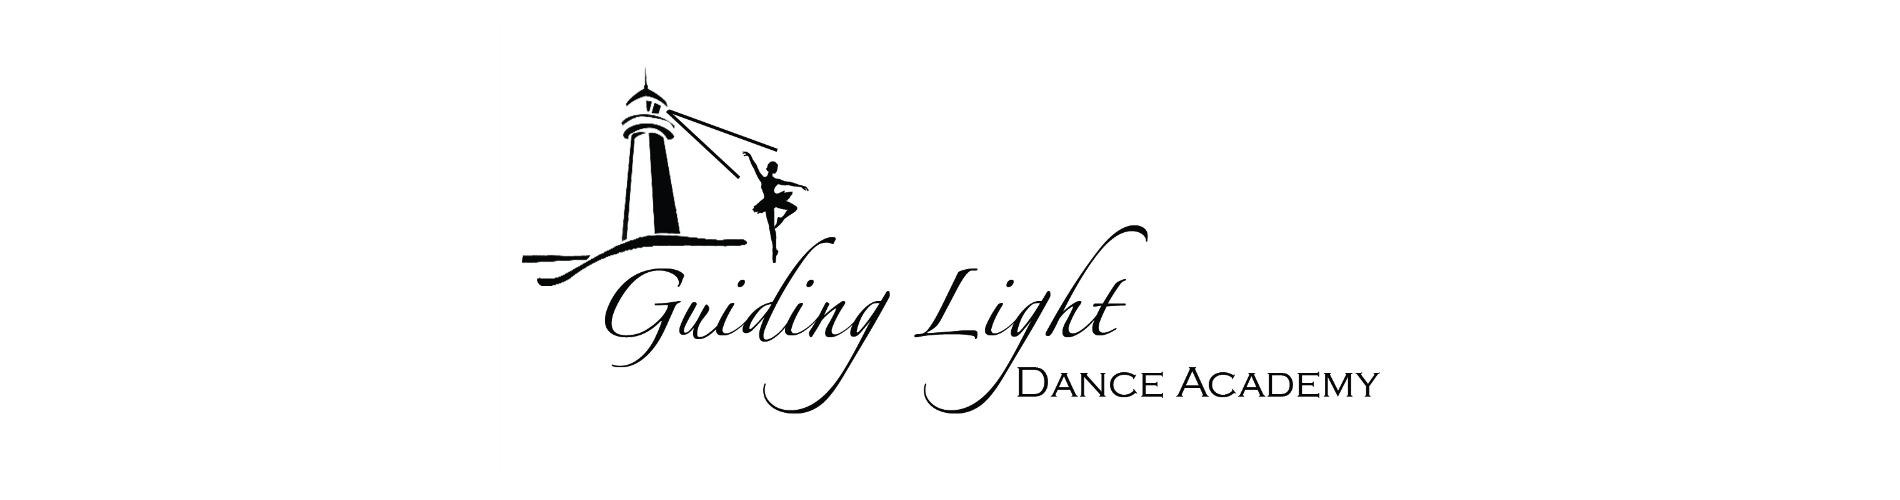 Guiding Light Dance Academy